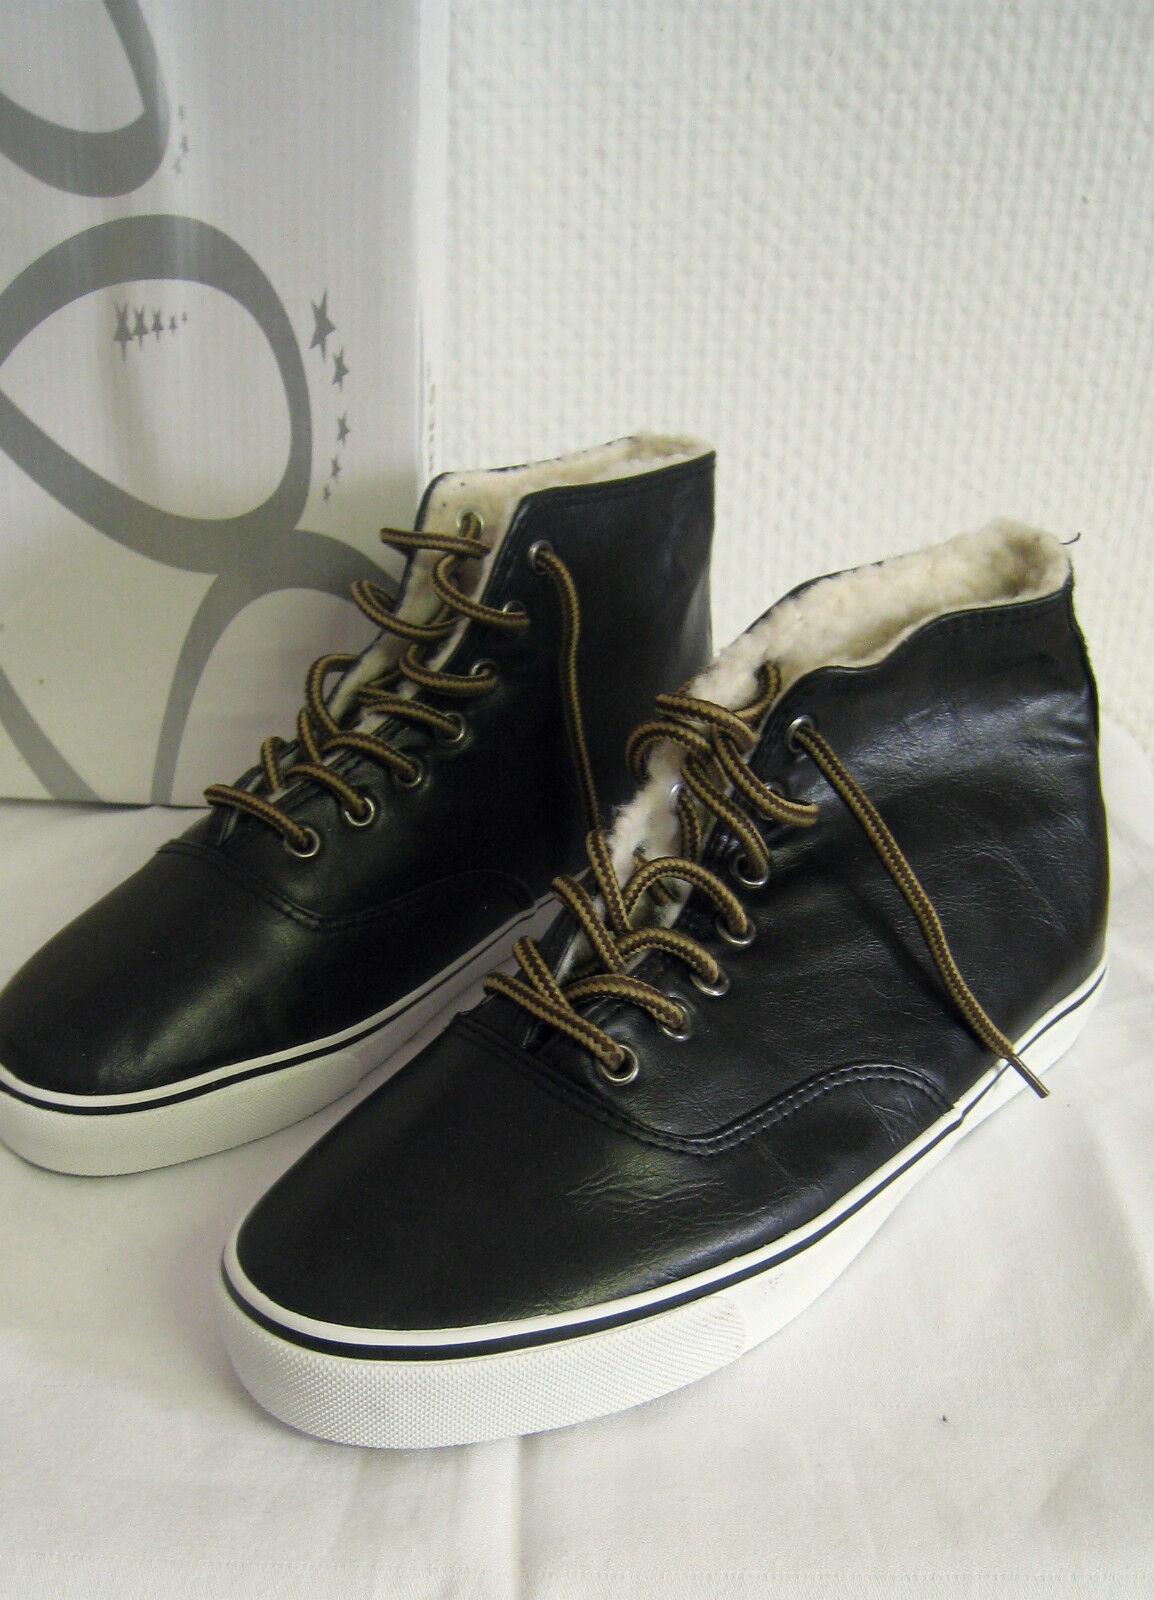 Chaussures Femmes High-top baskets Noir ab0060 12 Paire   Paire Stock